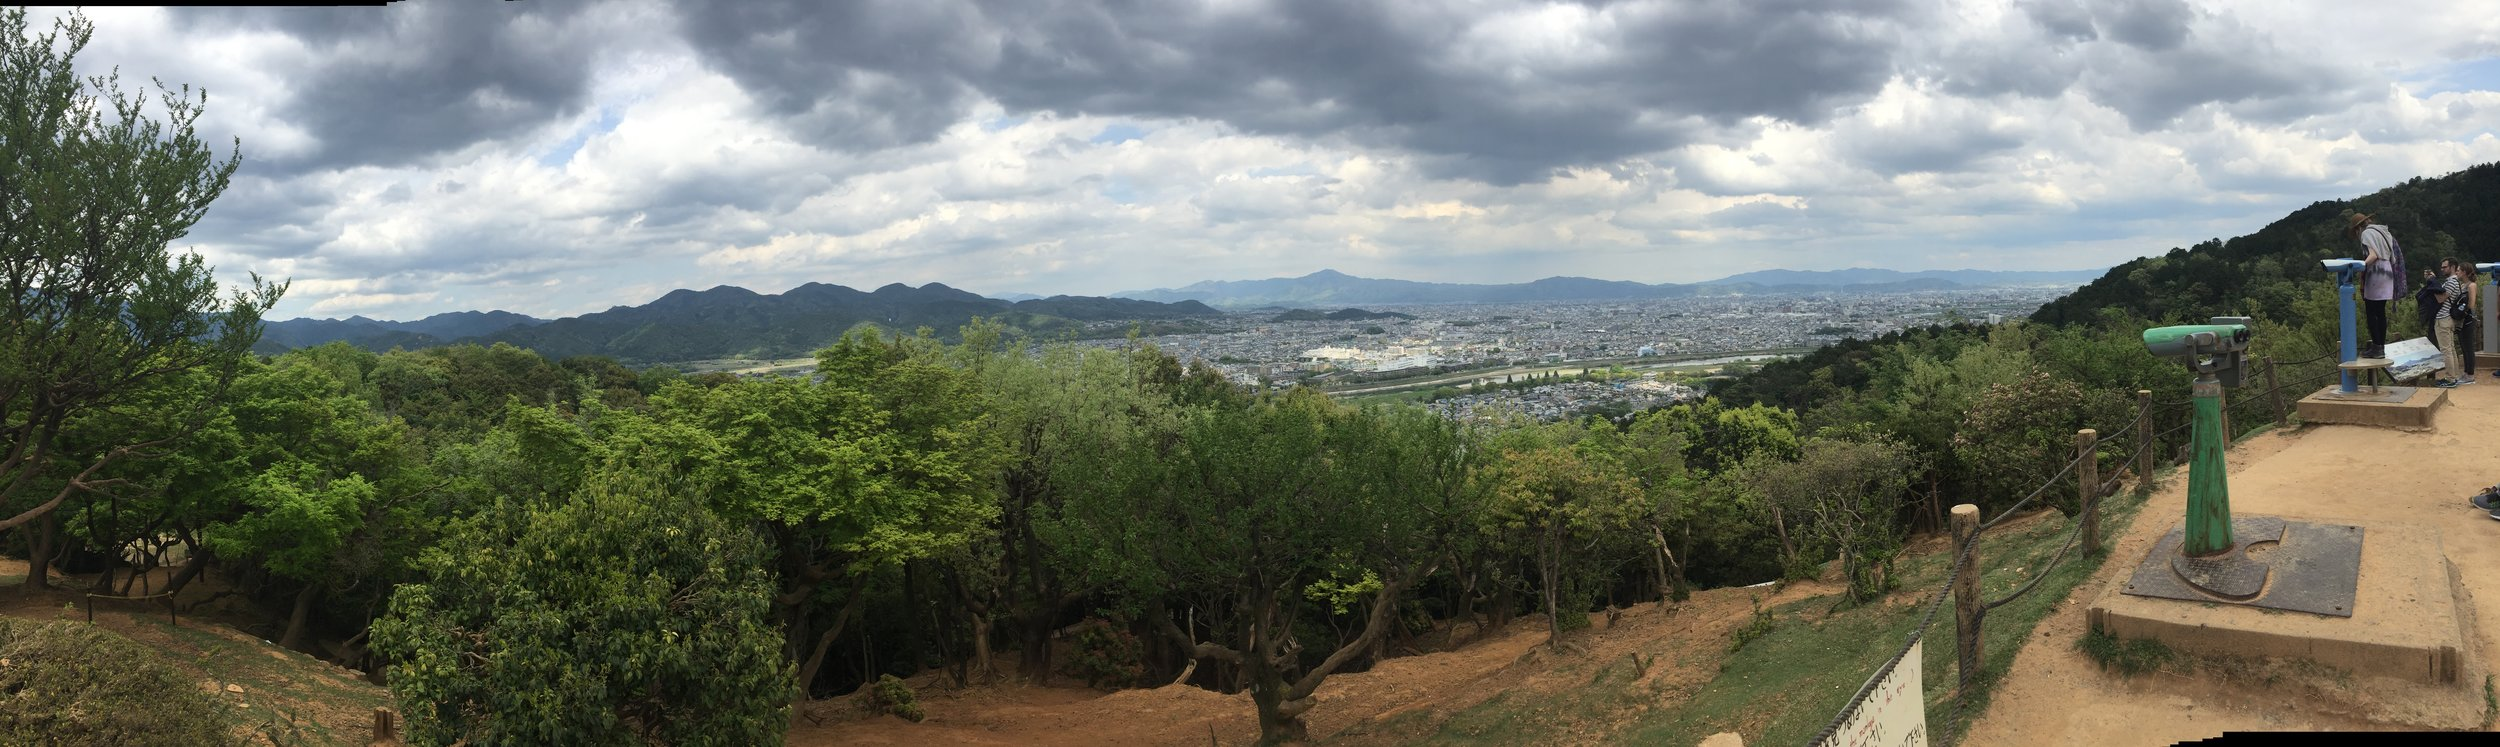 monkey's eye view of kyoto